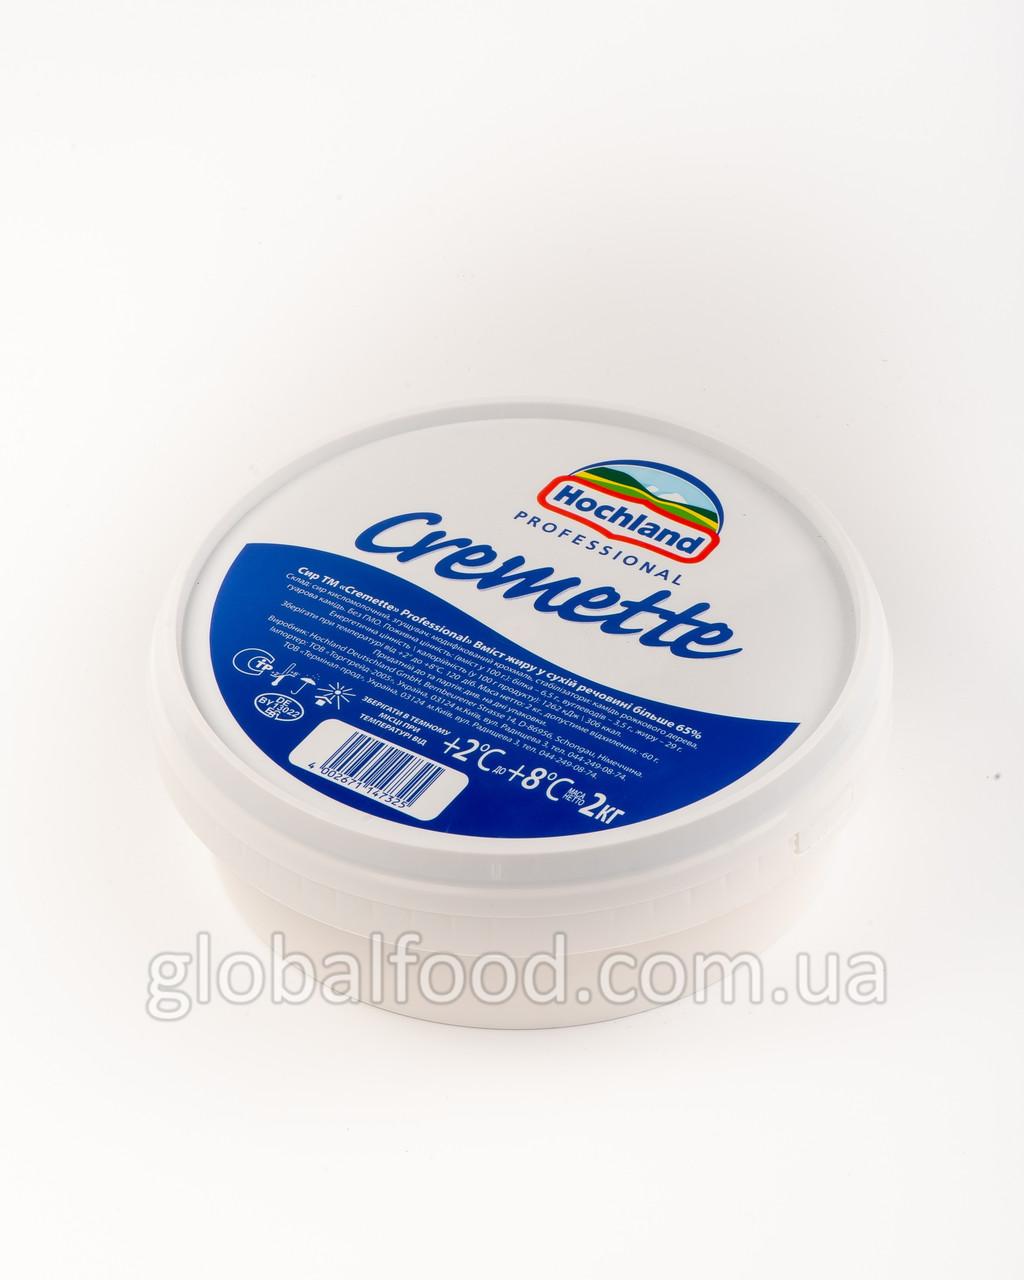 Сыр Сливочный 65% Hochland Сremette Германия  2кг